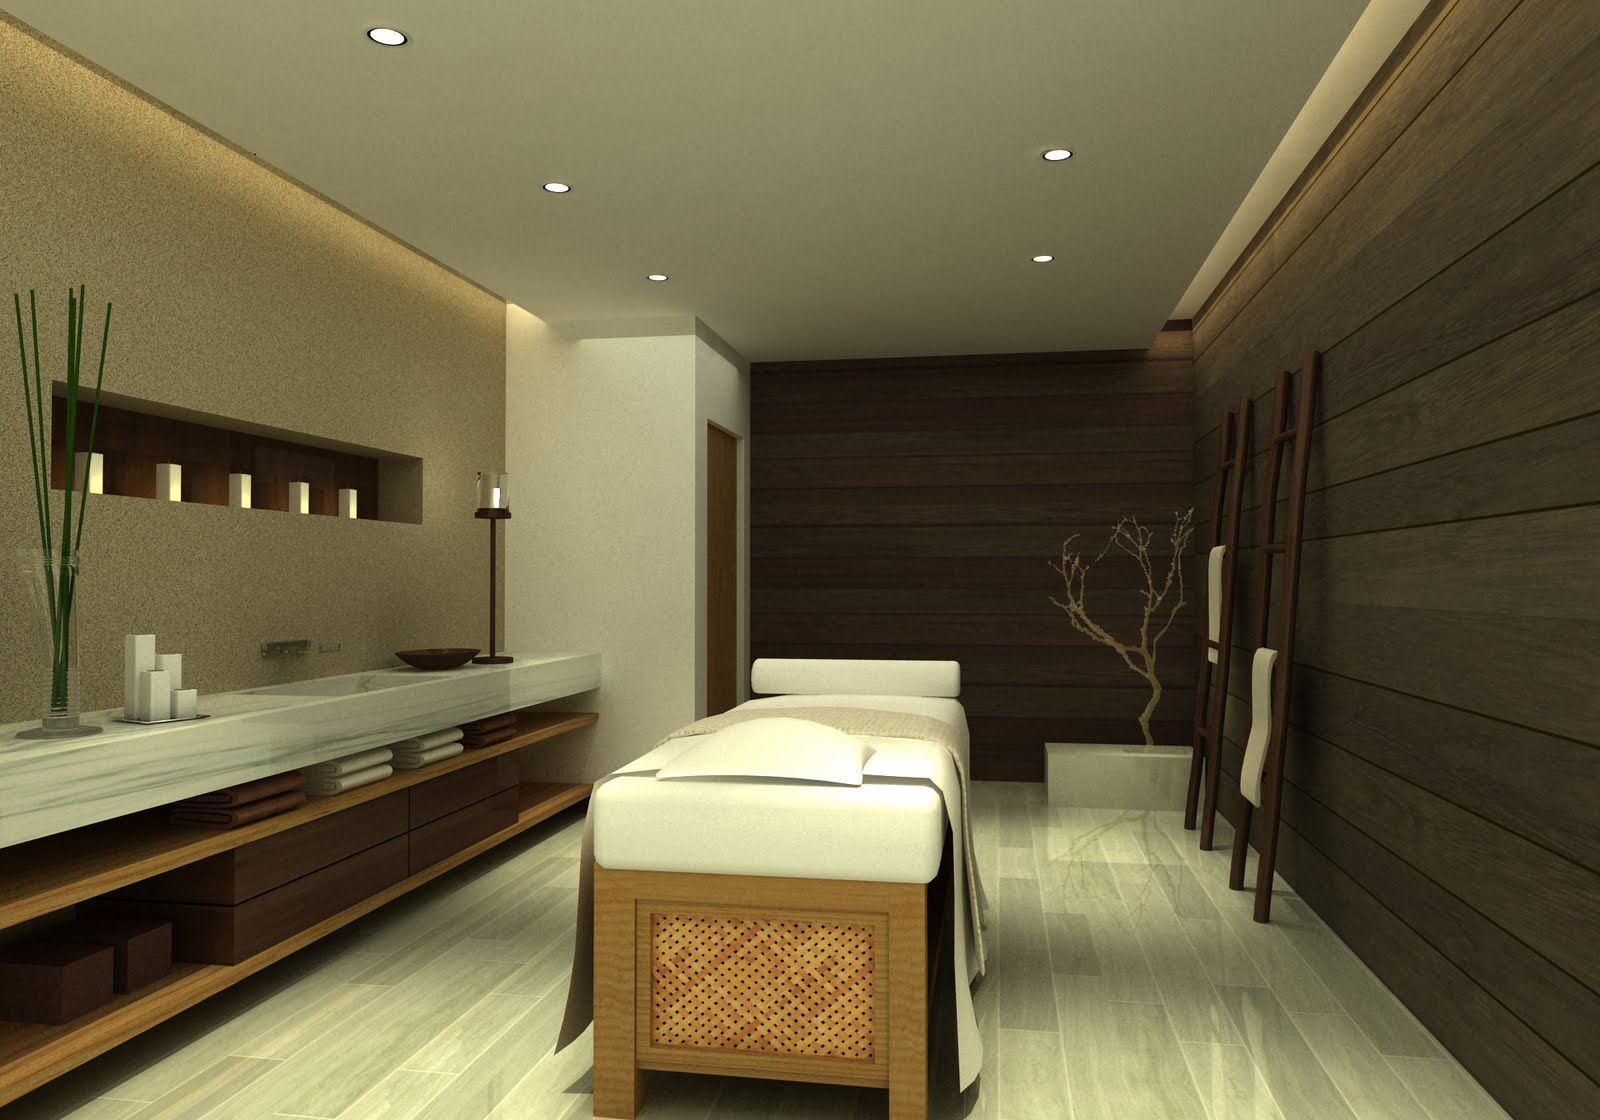 massage therapy room ideas  interior design for a massage